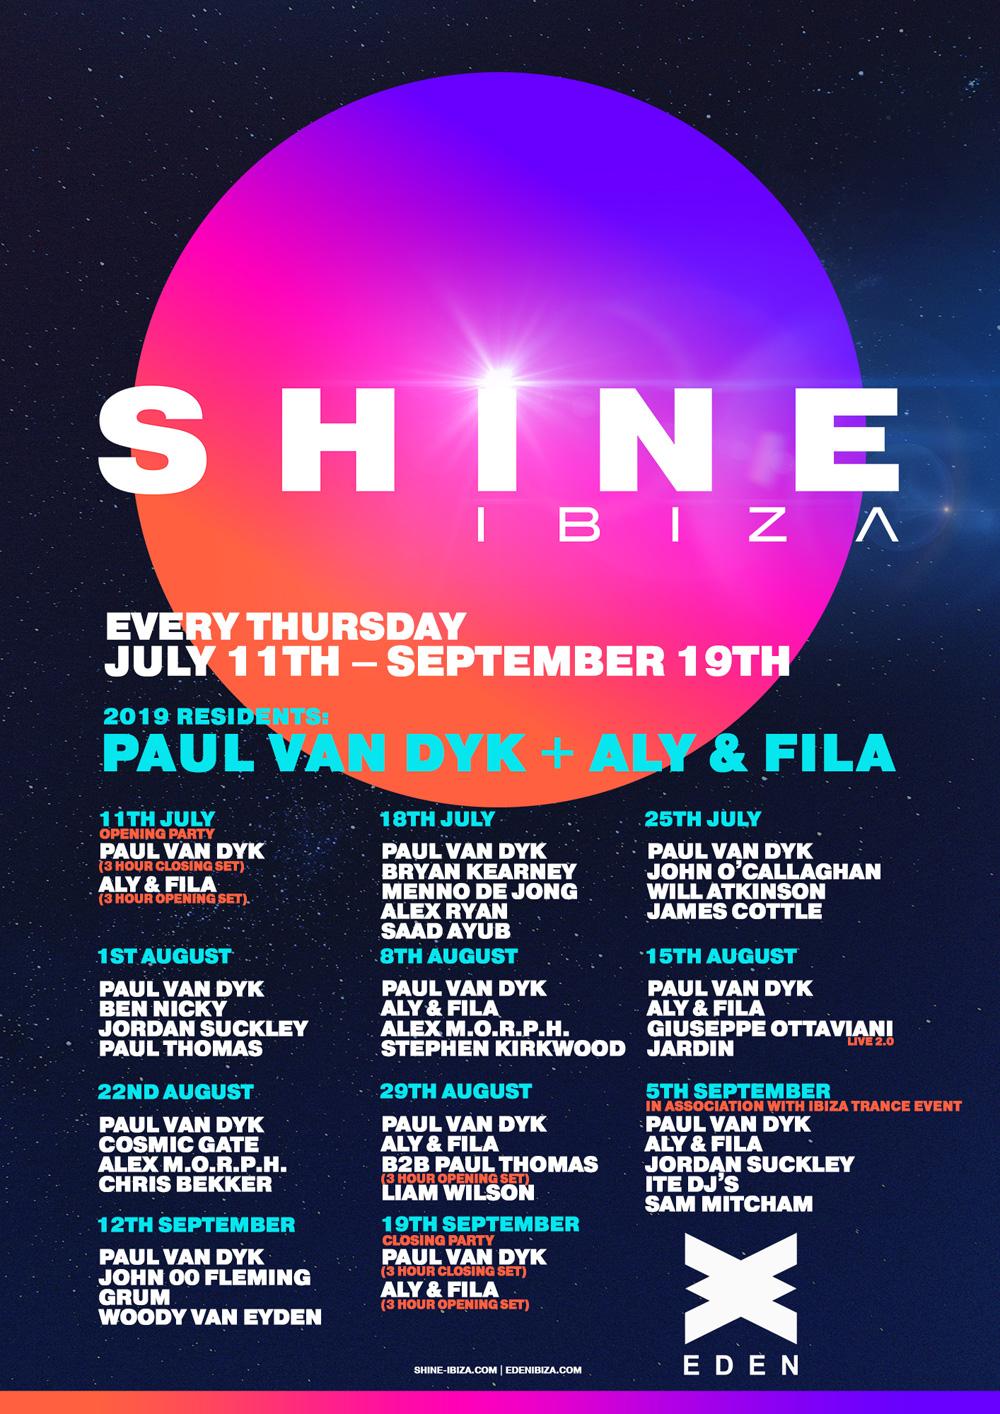 SHINE Ibiza 2019 Dates and Lineups